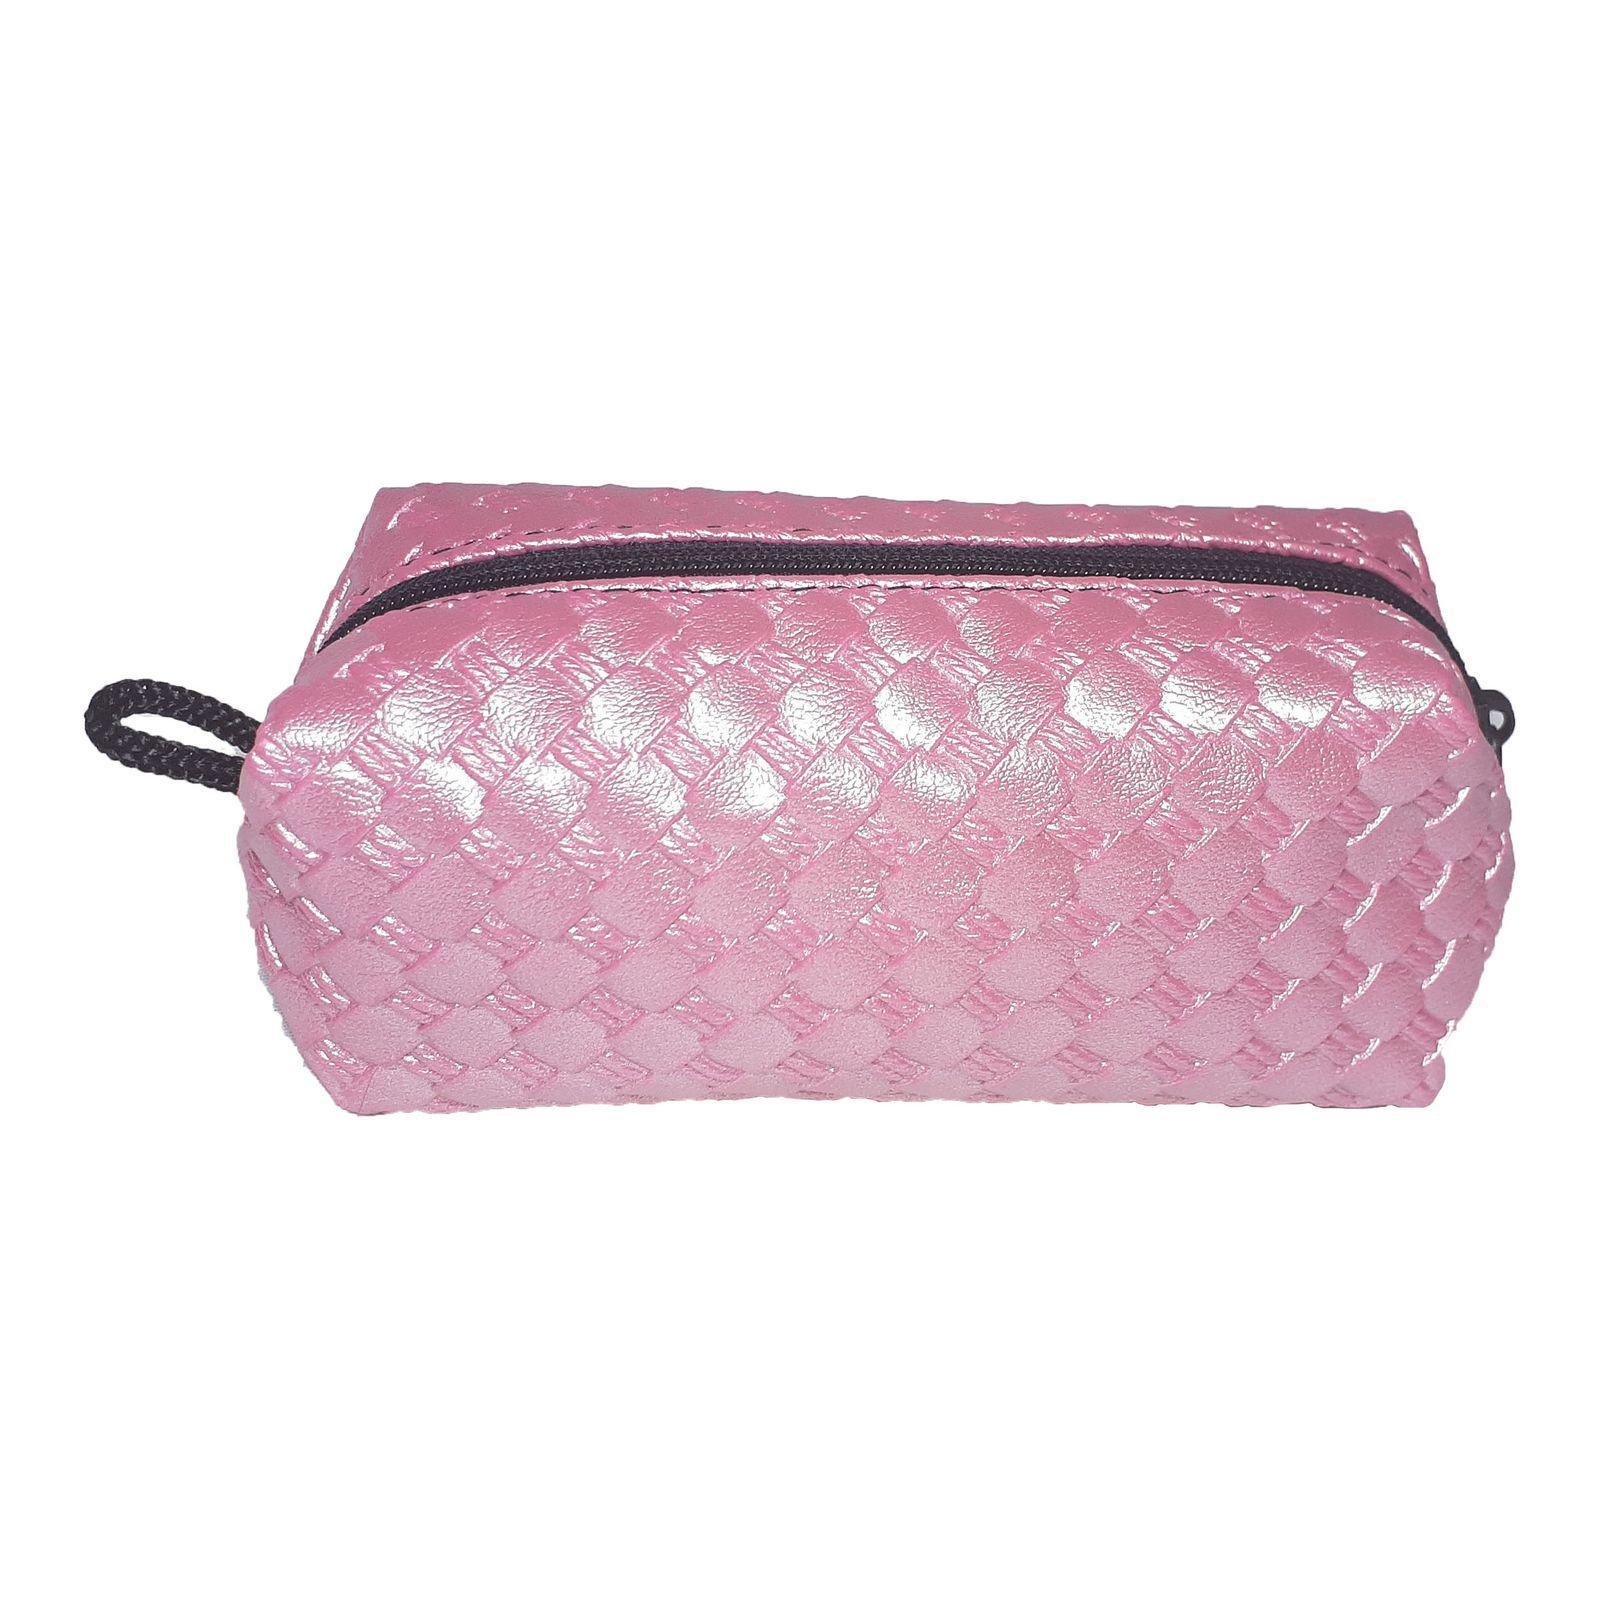 کیف لوازم آرایش زنانه کد GT0105 -  - 8